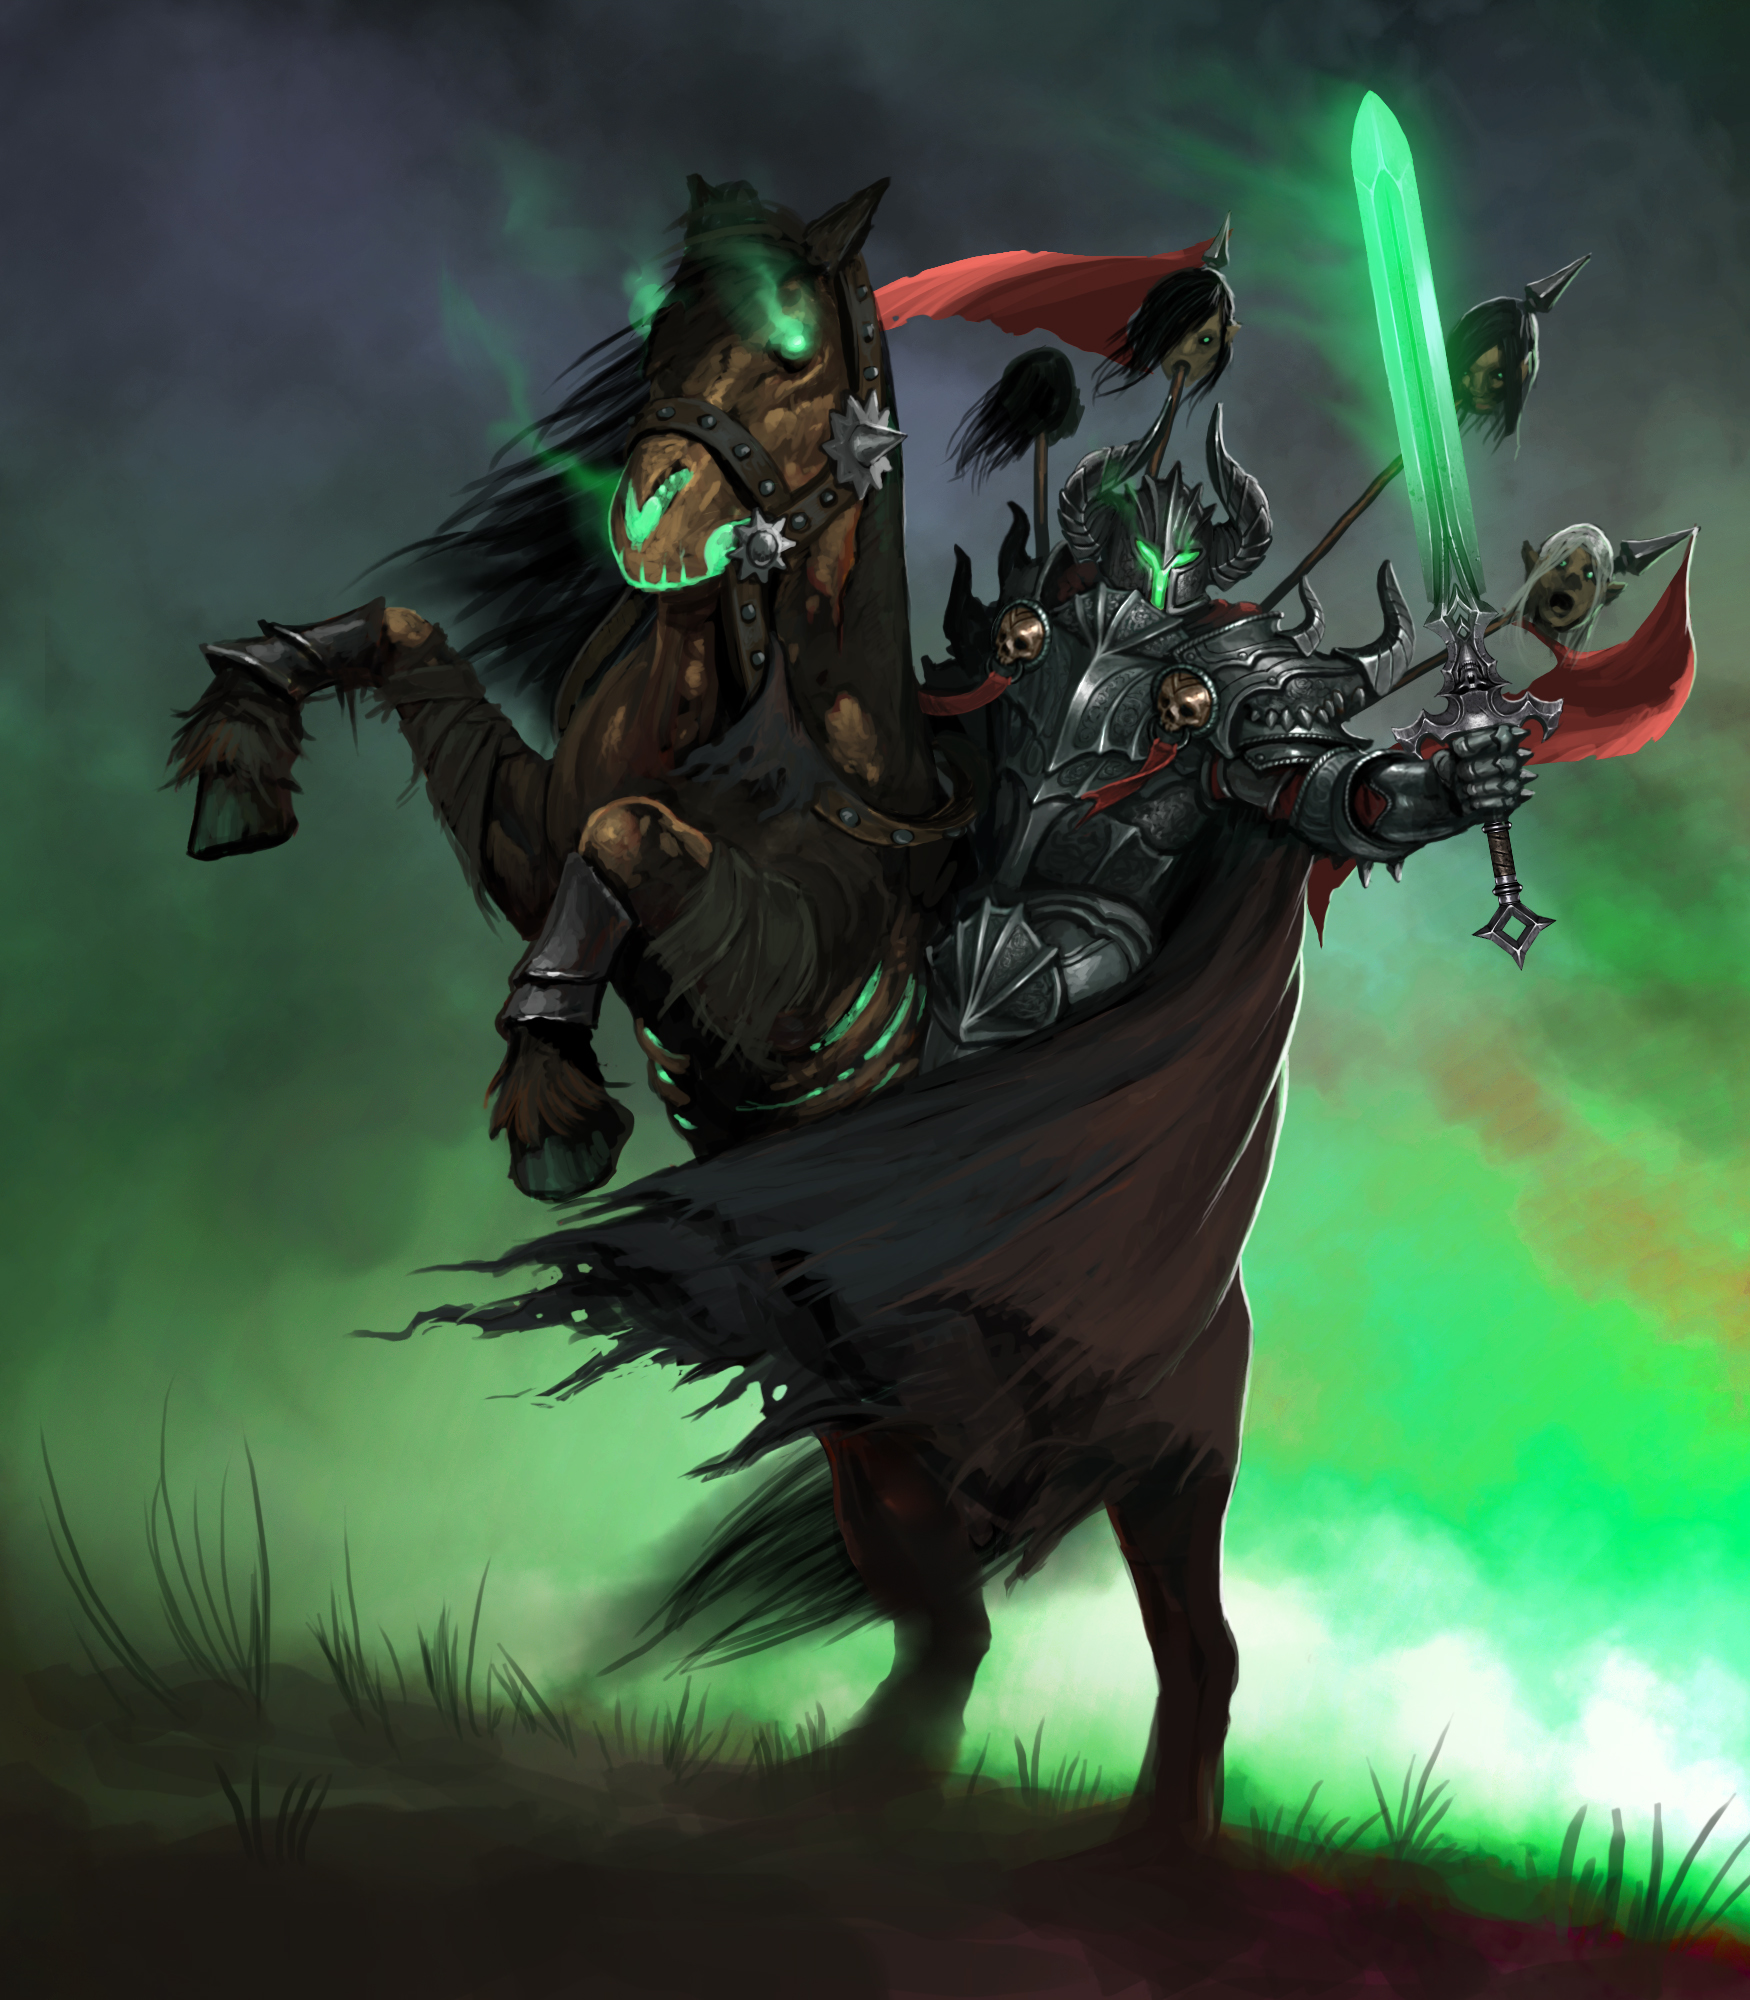 Death Knight (5e Paladin Archetype)   Blackbando's Homebrew Wiki   FANDOM powered by Wikia